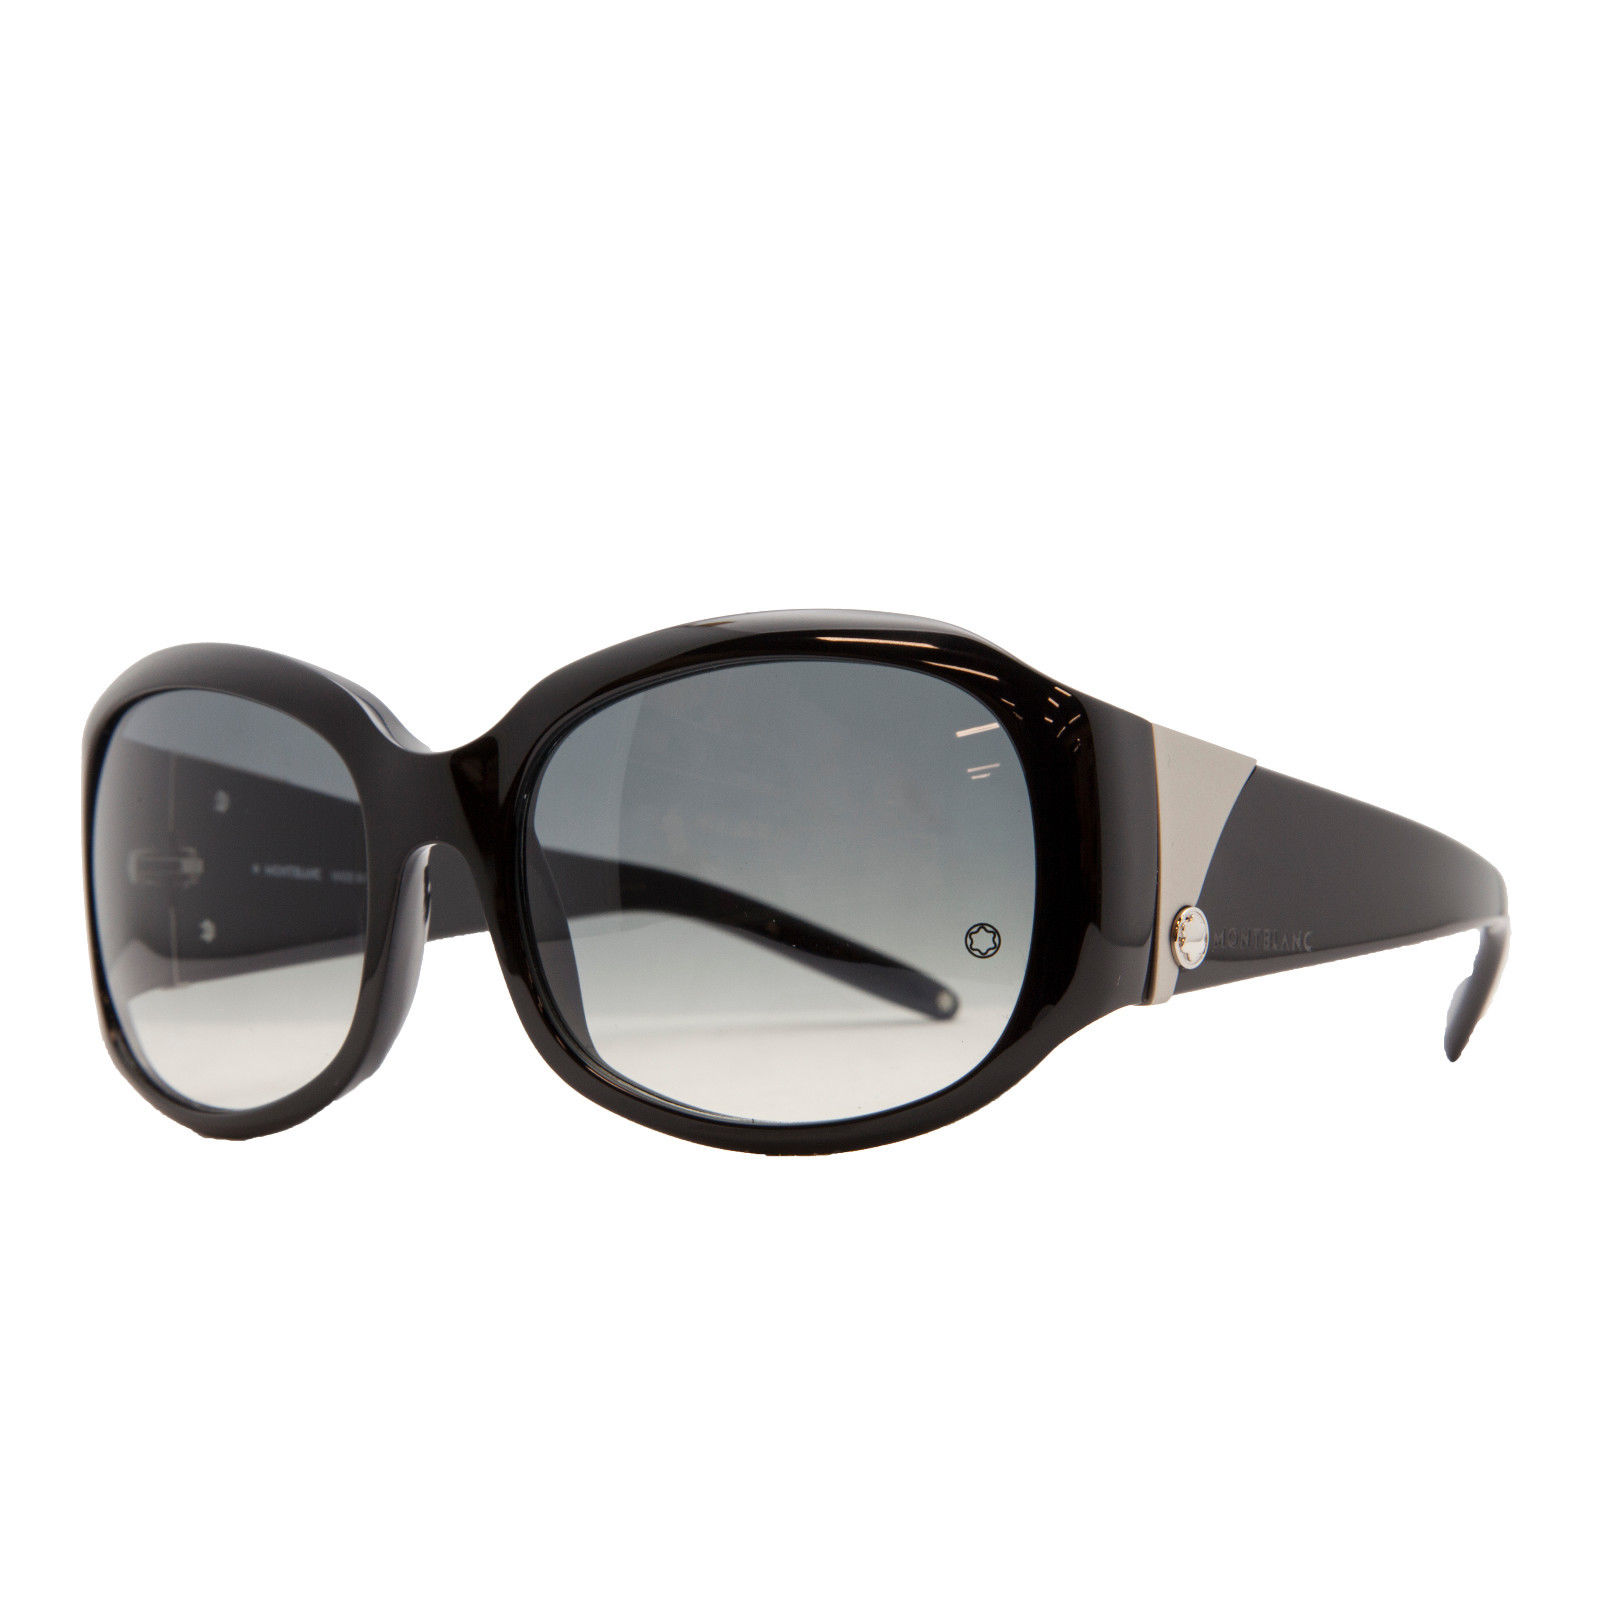 Mont Blanc MB 222/S 0B5 Black Oval Sunglasses